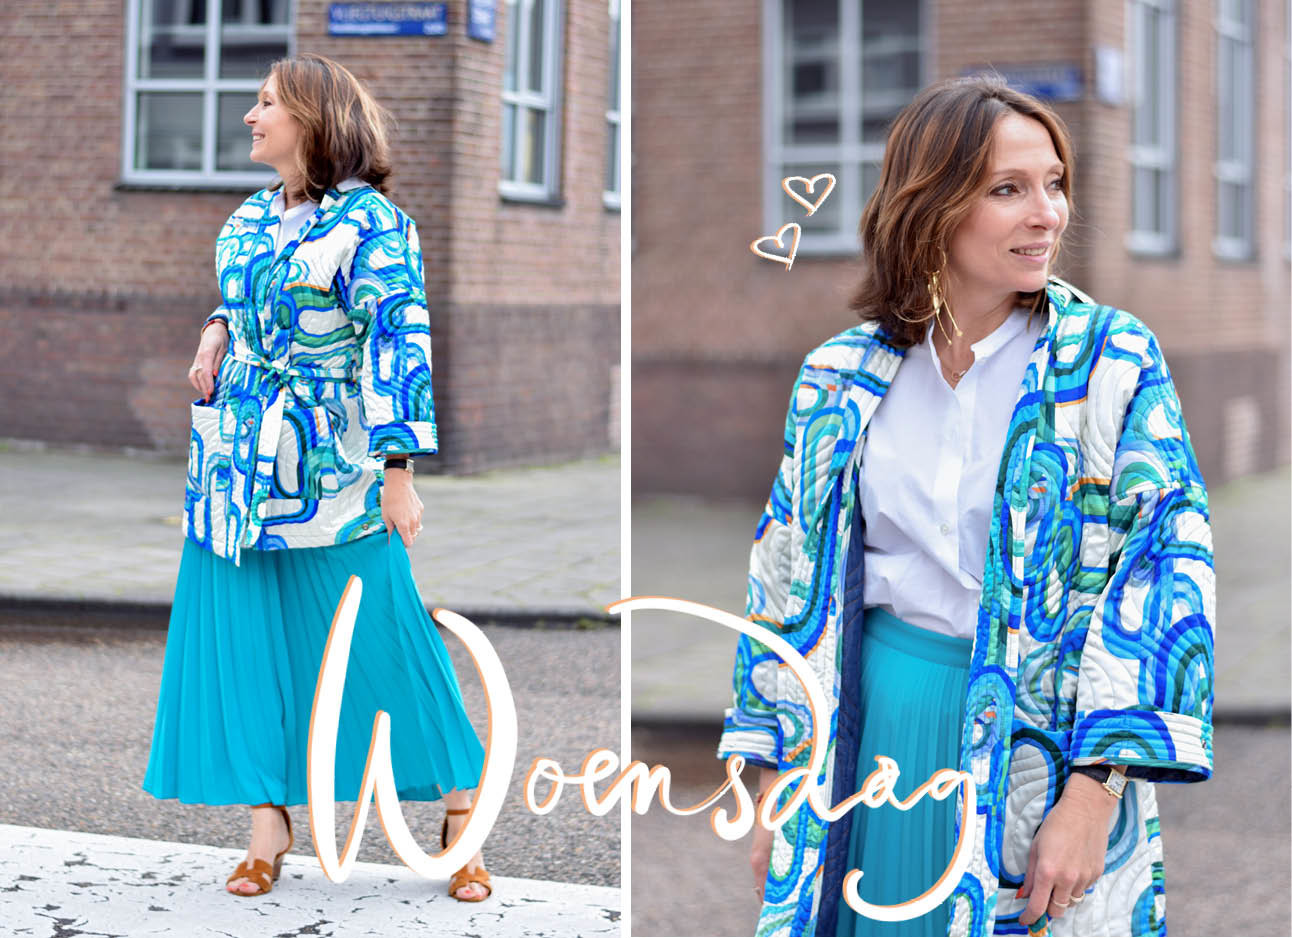 may in een blauwe rok met blauwe top en witte blouse